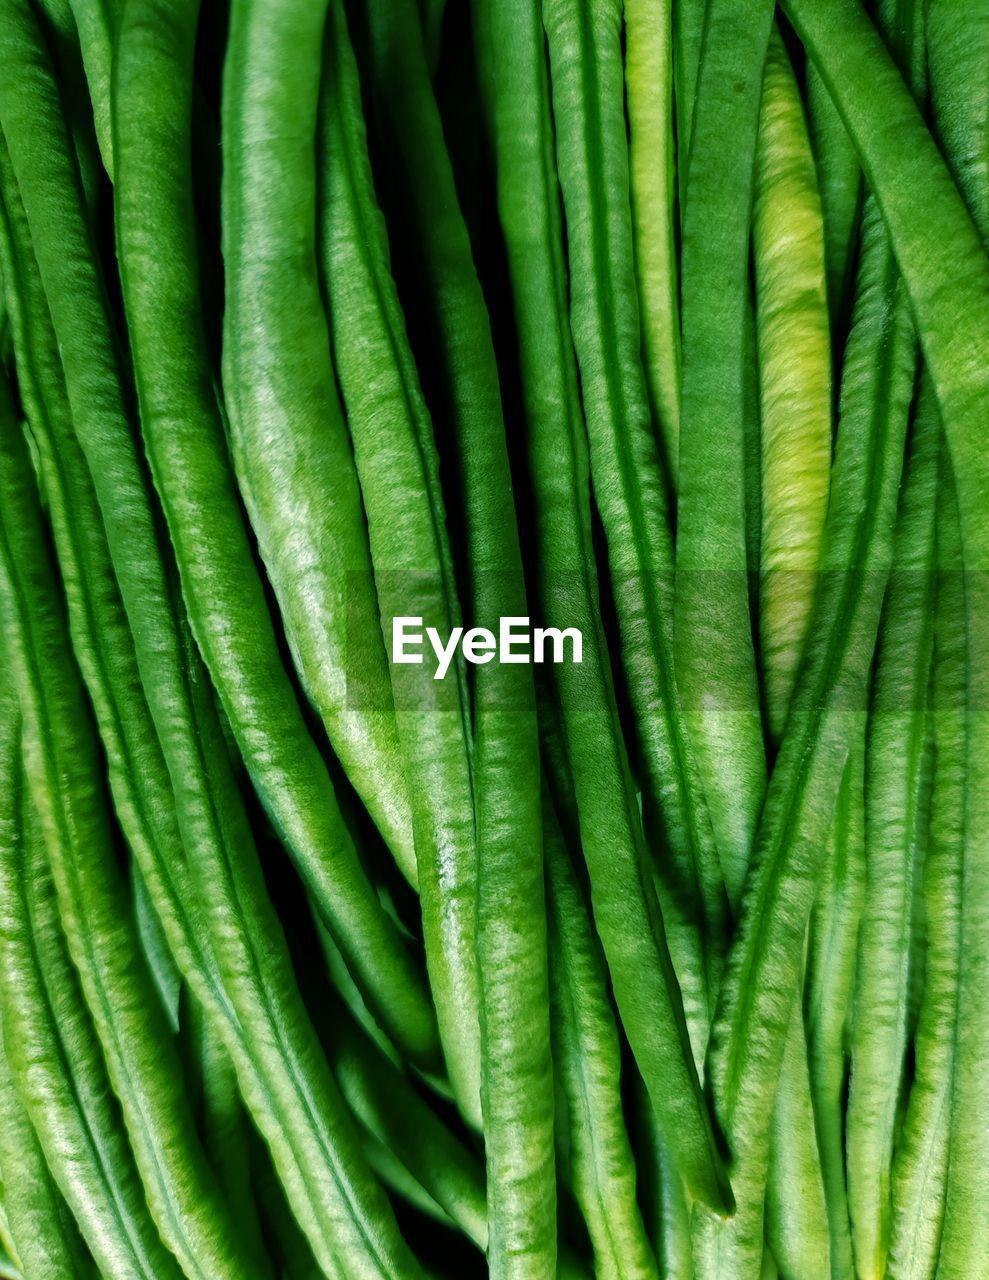 Full frame shot of vegetables best beans green supper market sale on bean collection